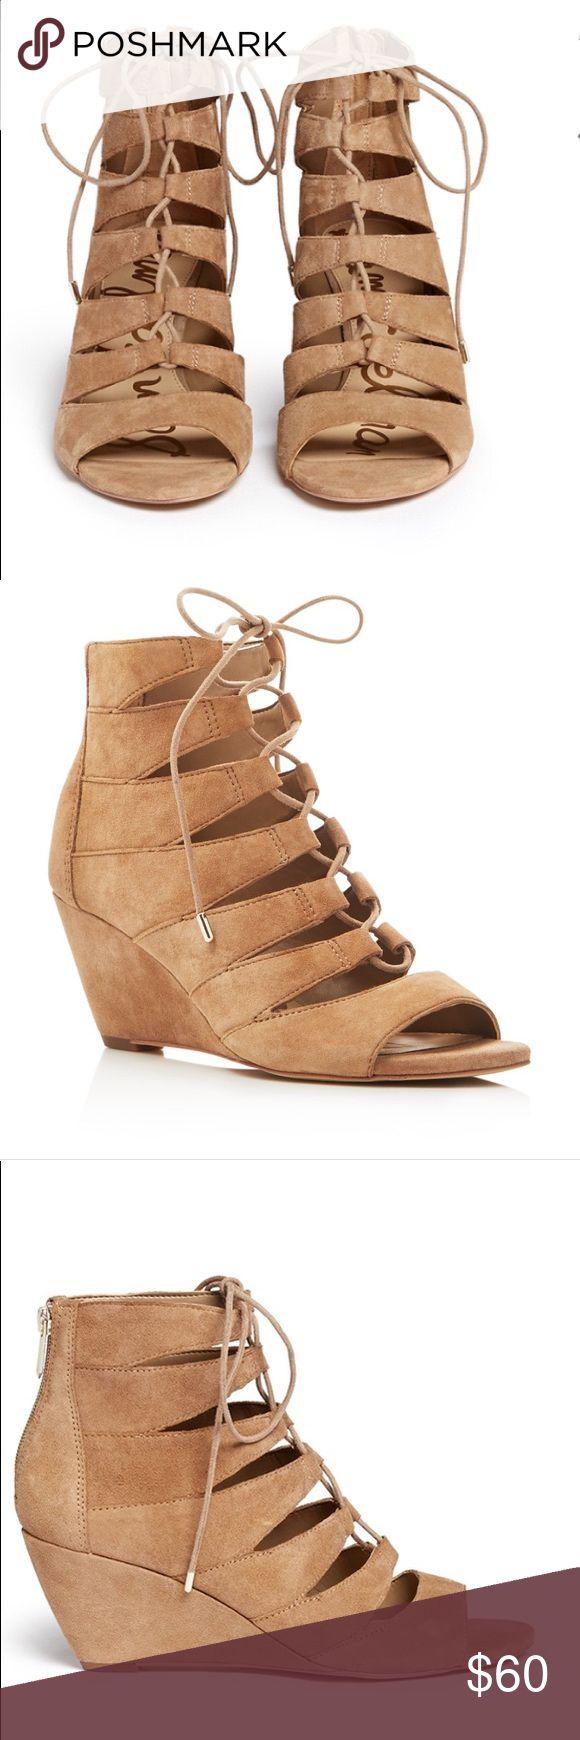 🚨1DAY SALE🚨Sam Edelman 'Santina' Wedge Sam Edelman 'Santina' caged lace-up suede wedge sandals in good condition Sam Edelman Shoes Sandals